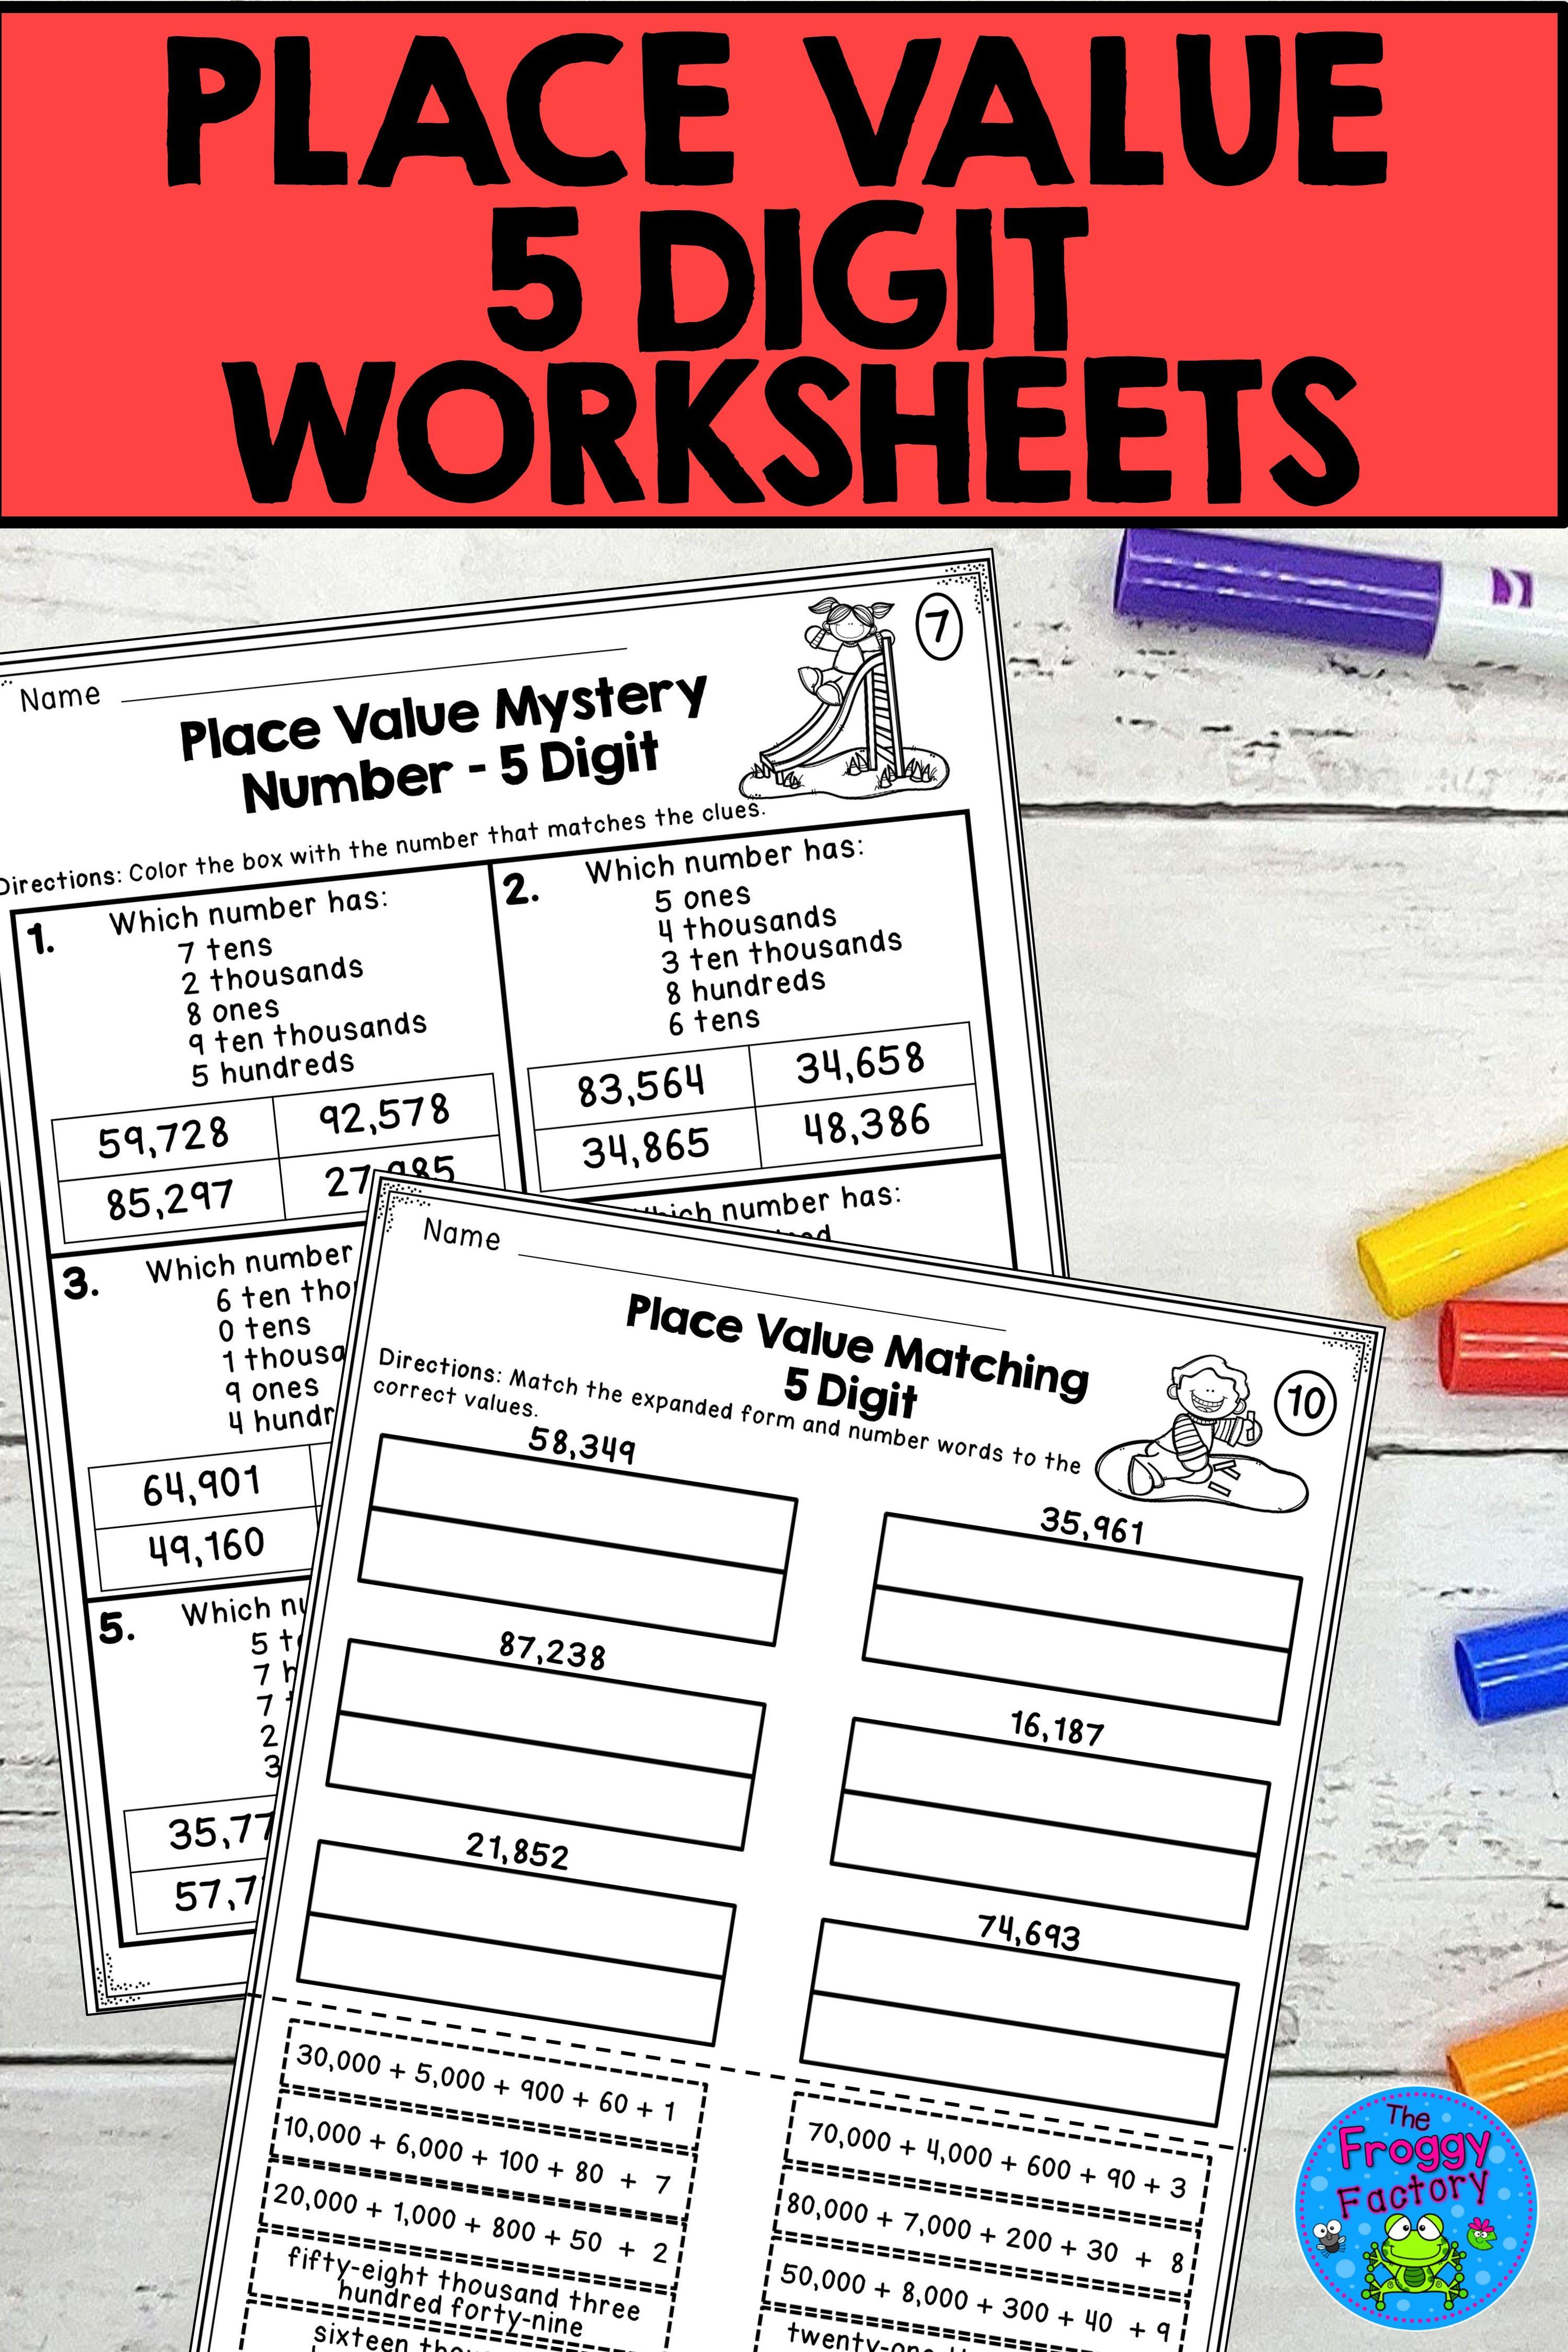 Place Value 5 Digit Worksheets   Place value worksheets [ 4500 x 3000 Pixel ]